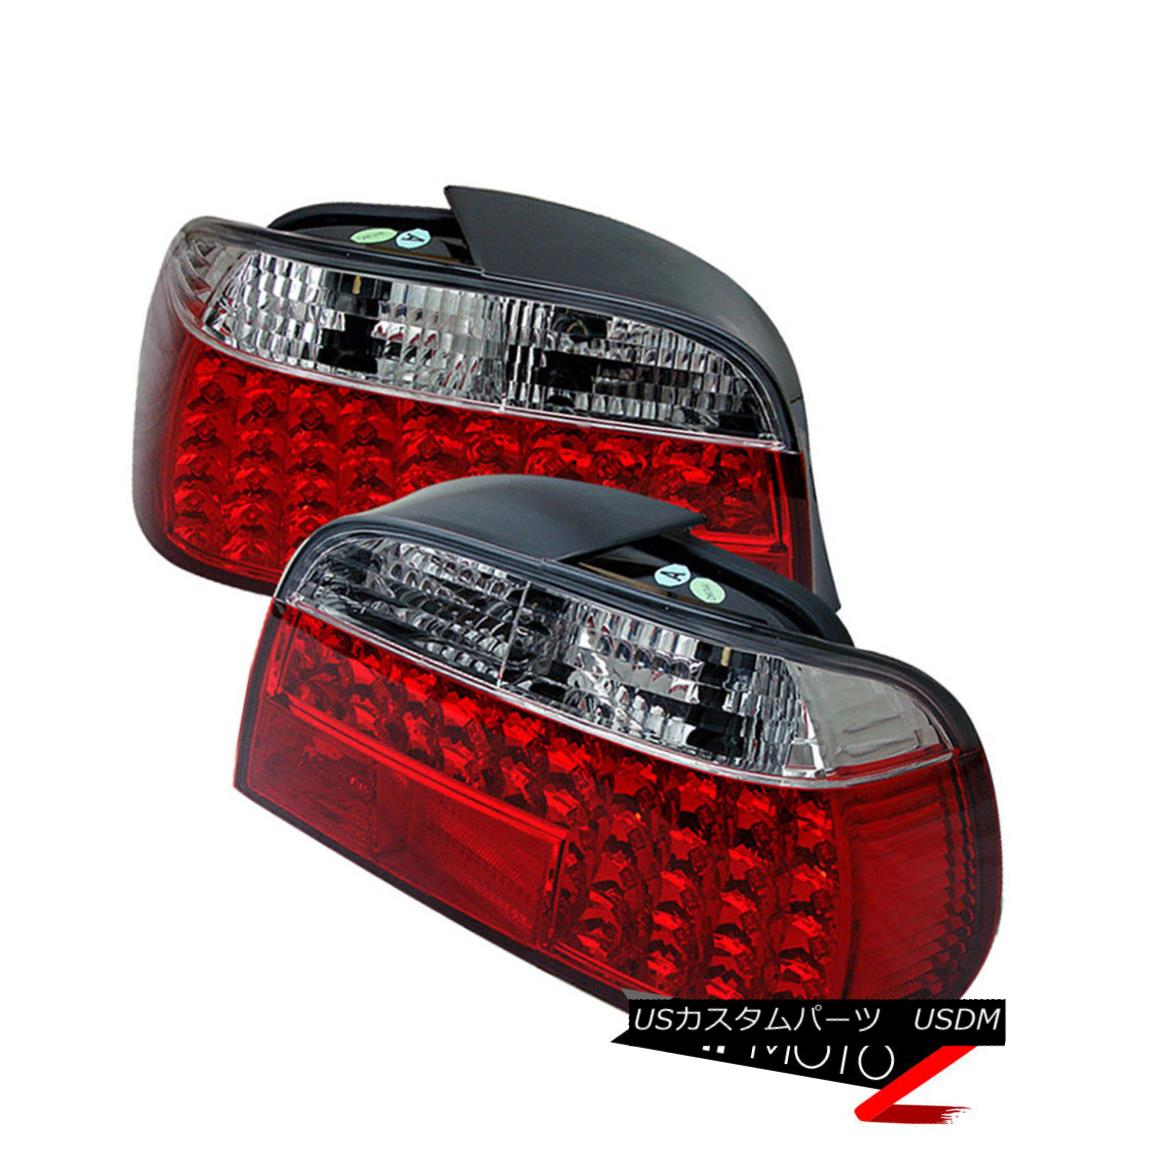 11~15 922012M540 OEM LED Fog Lamp Light OEM LH+Cover for Hyundai Genesis Coupe